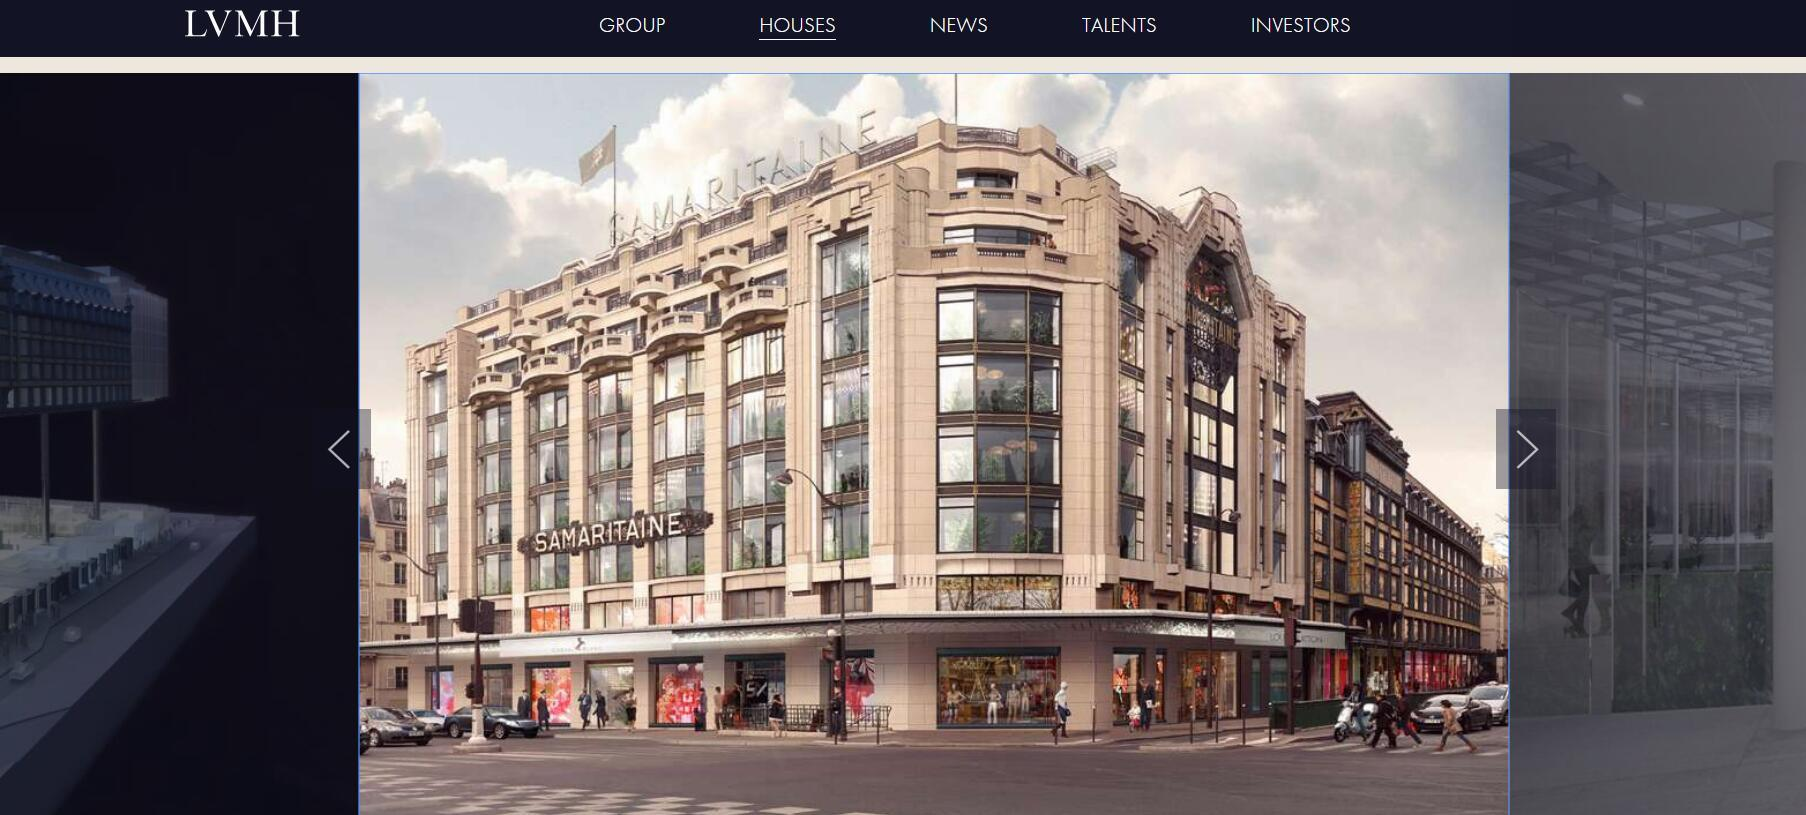 LVMH 集团预热明年开业的巴黎地标建筑 La Samaritaine